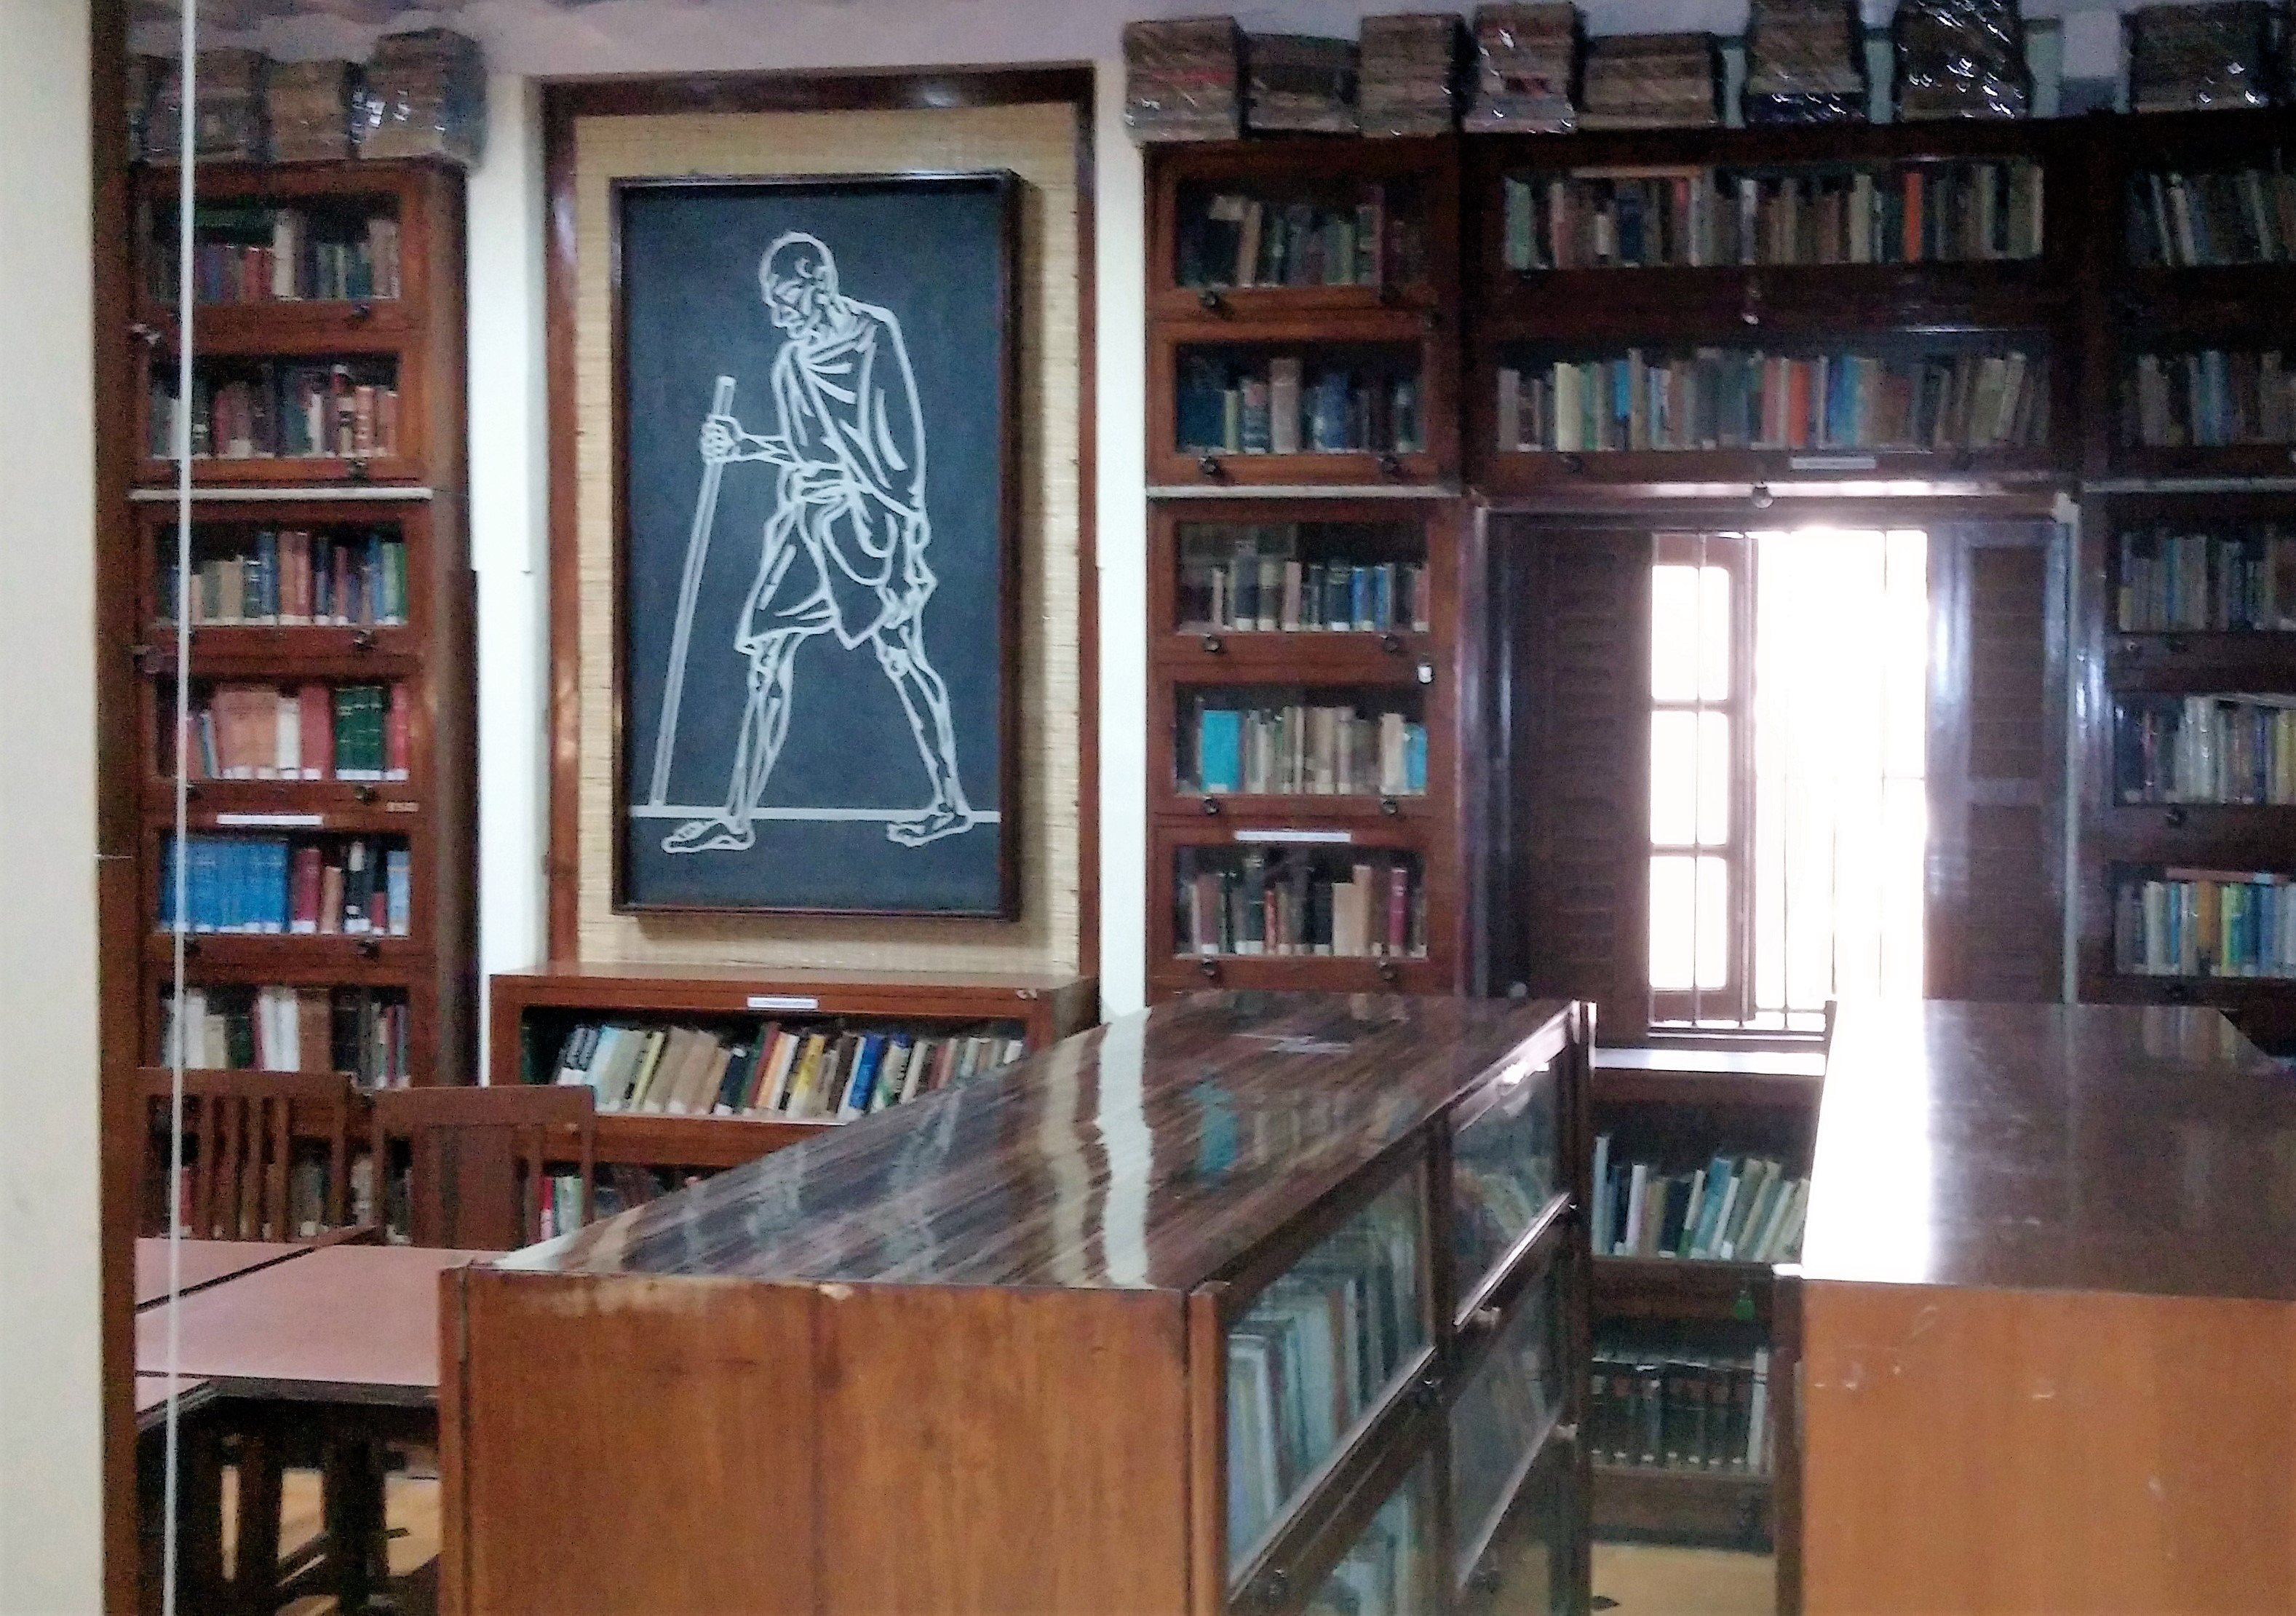 Gandhi library